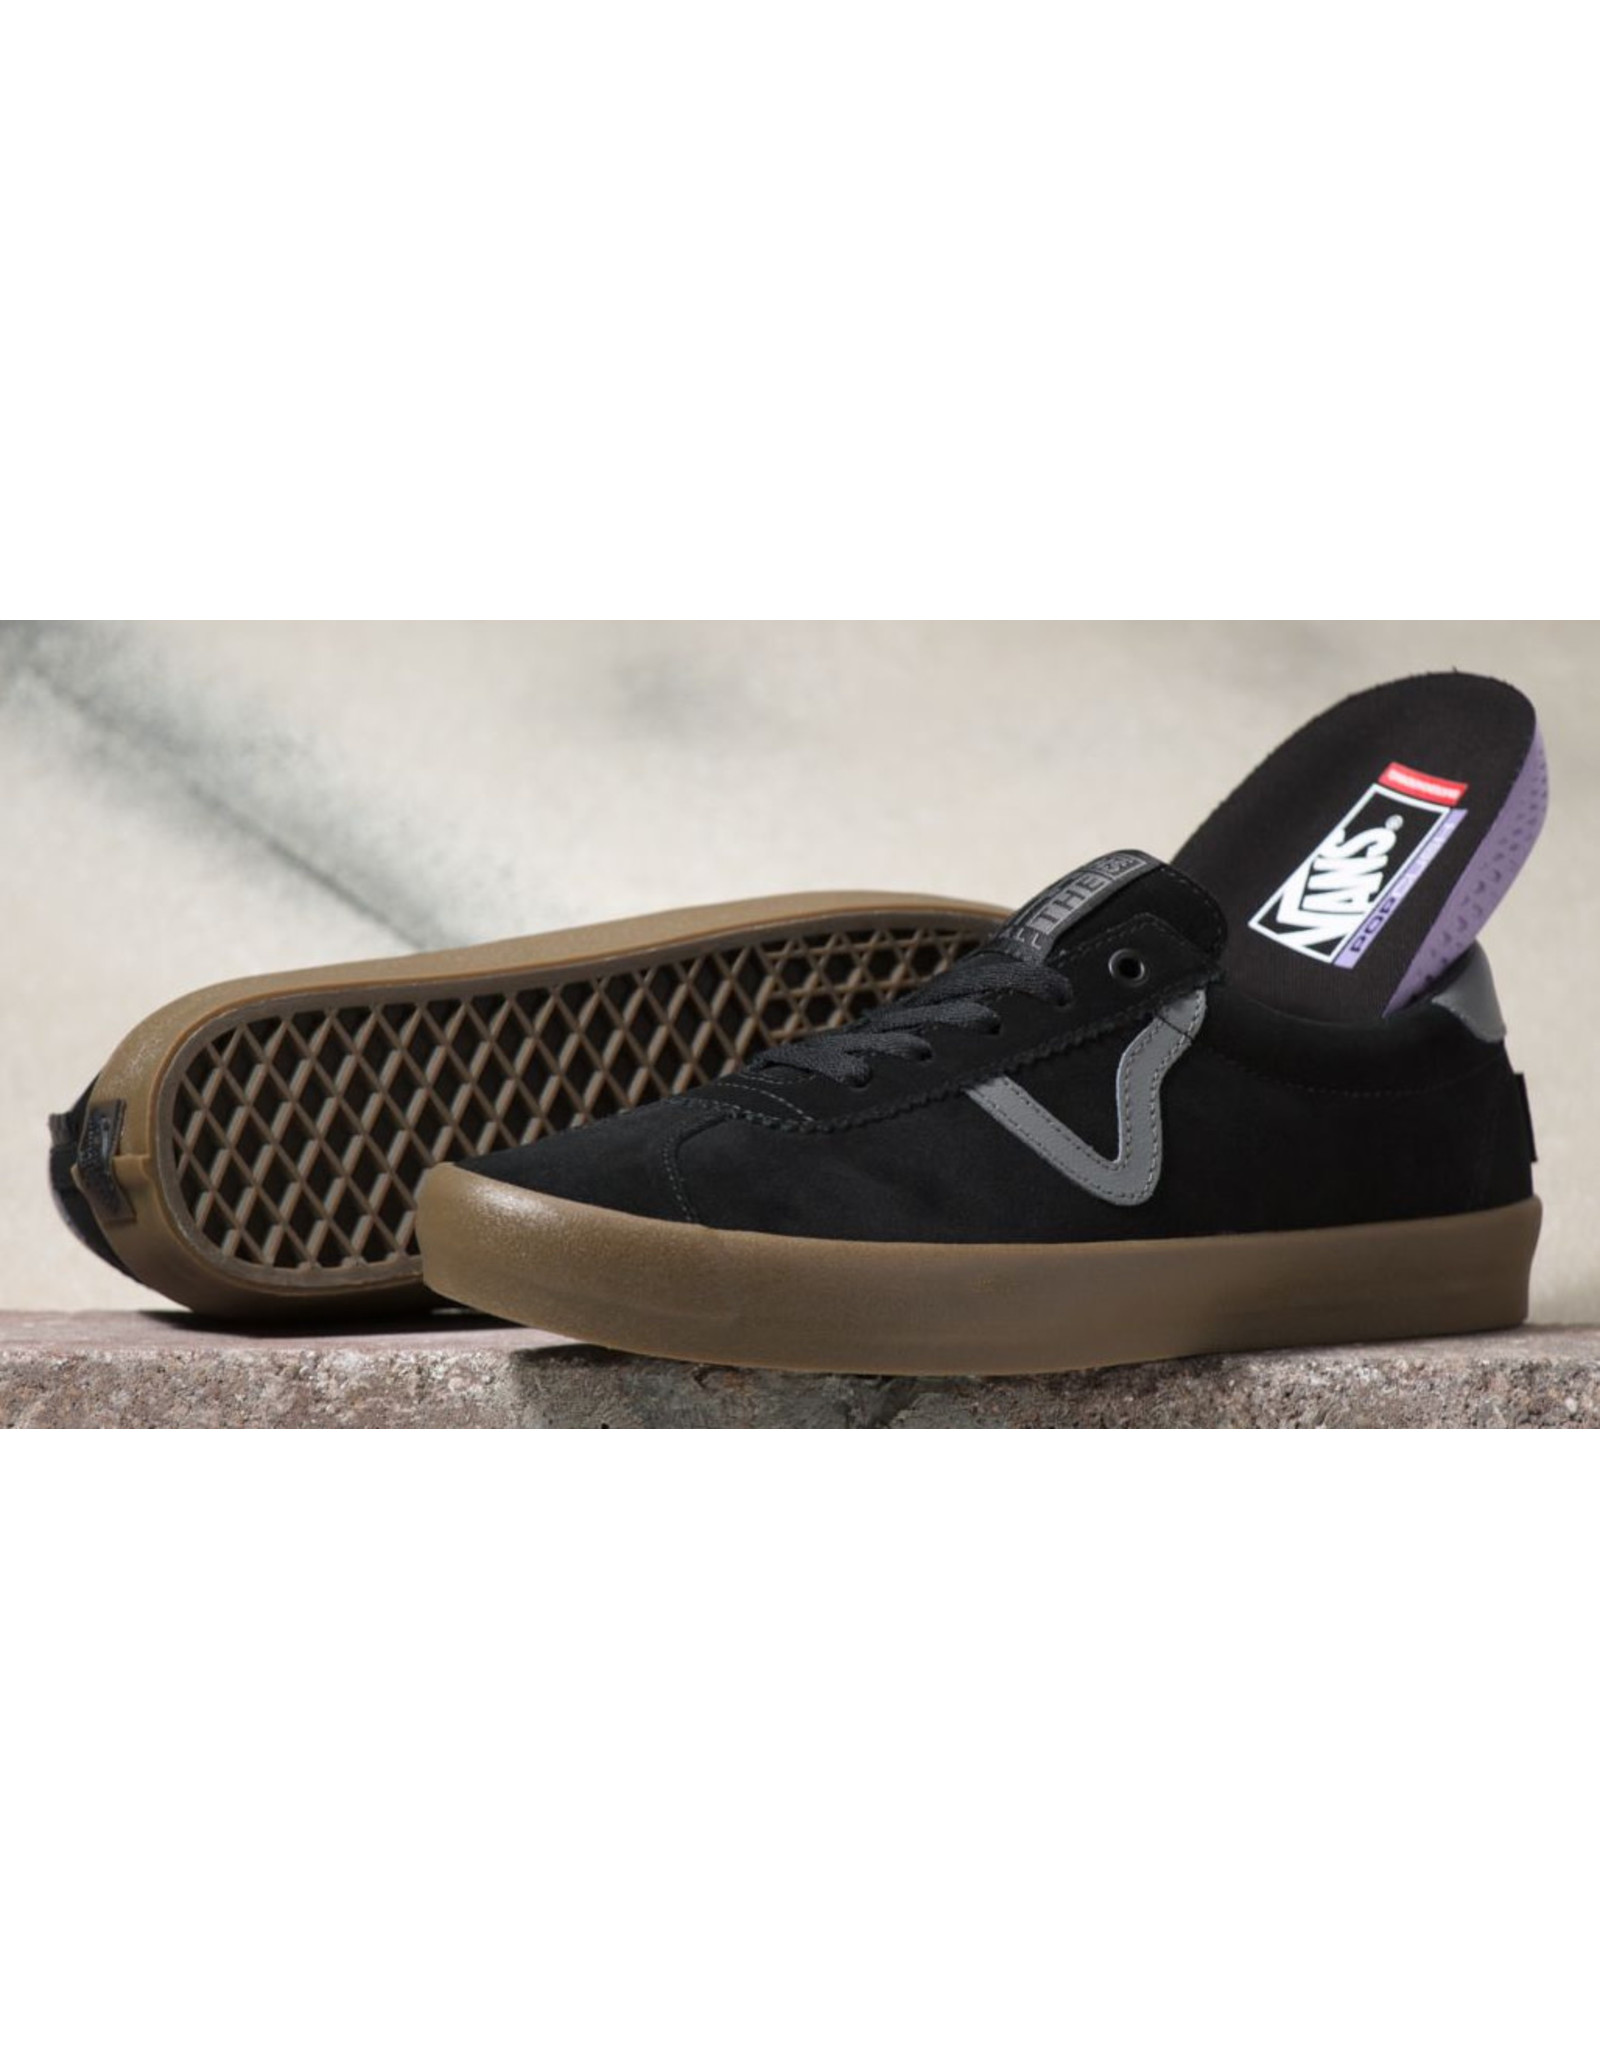 Vans Skate Sport